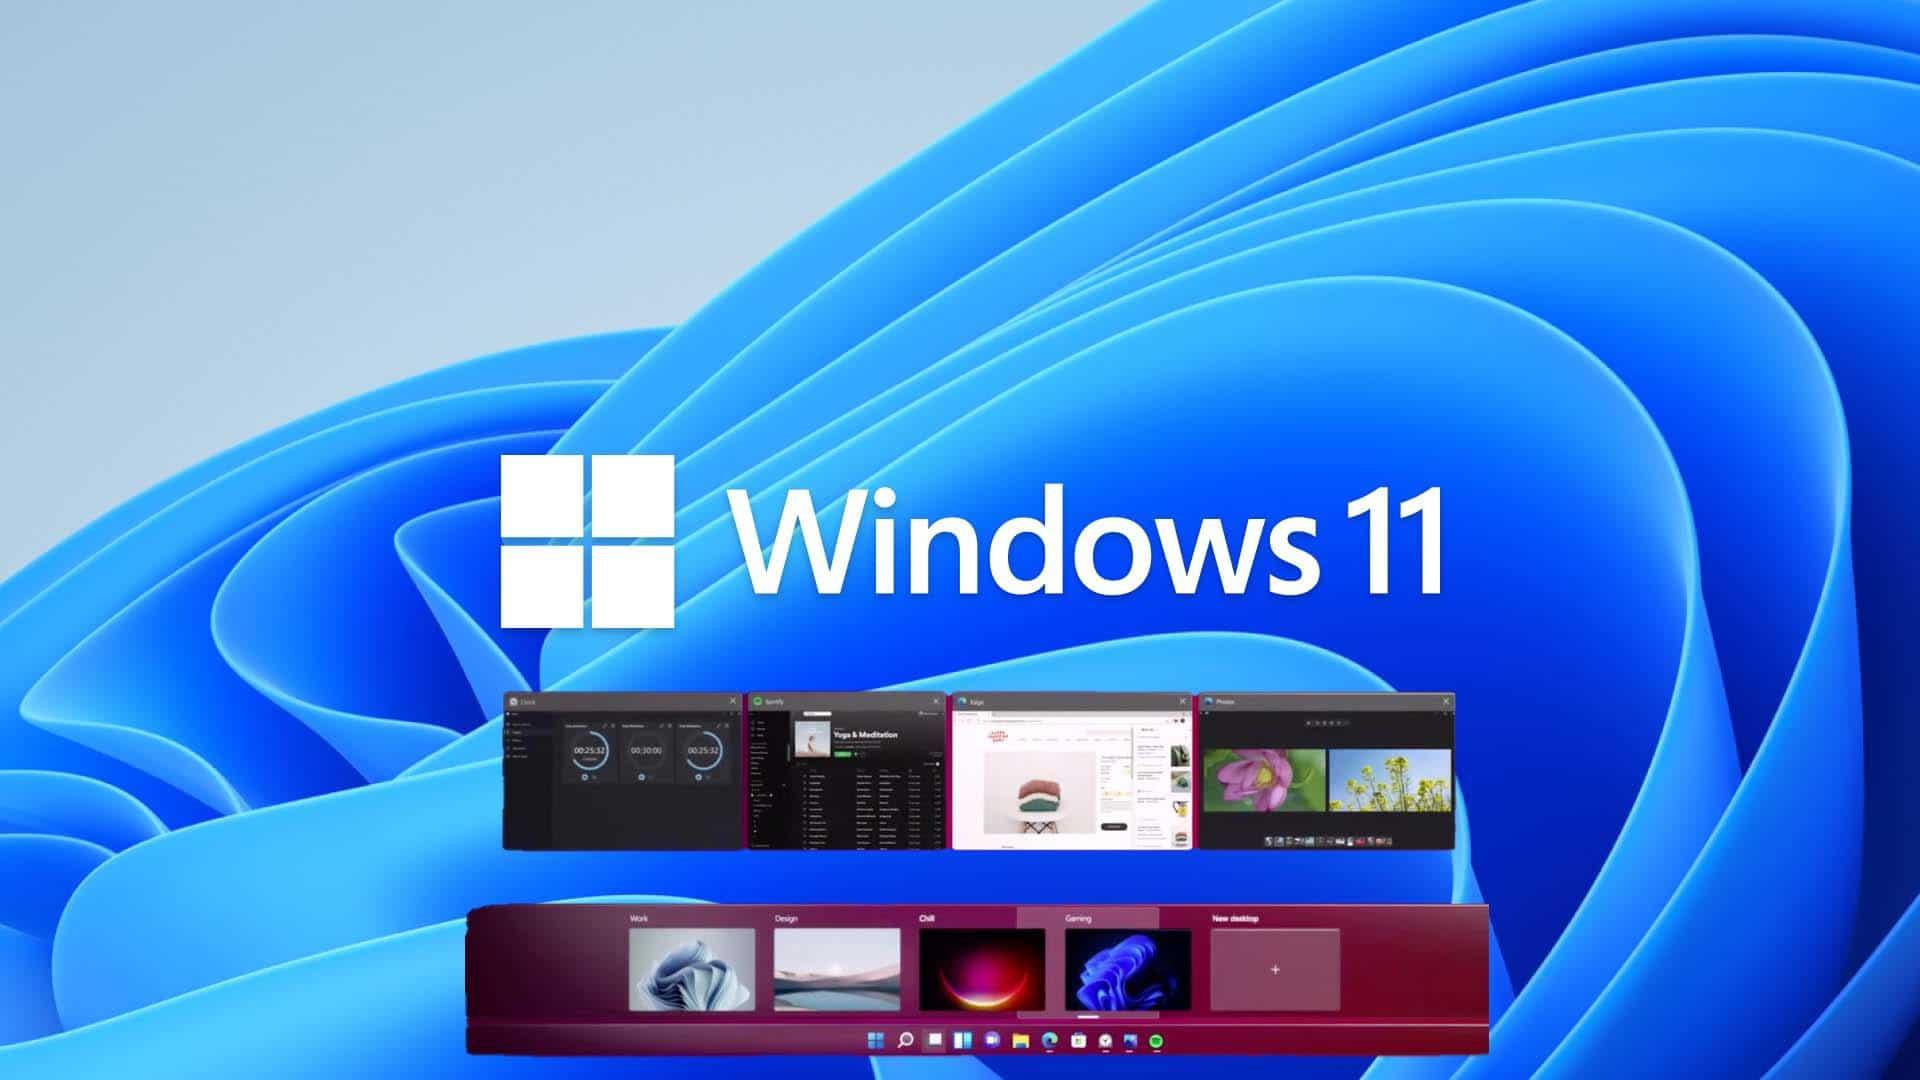 Windows-11-ใหม่-มีอะไรน่าสนใจบ้าง-พร้อมวิธีติดตั้ง